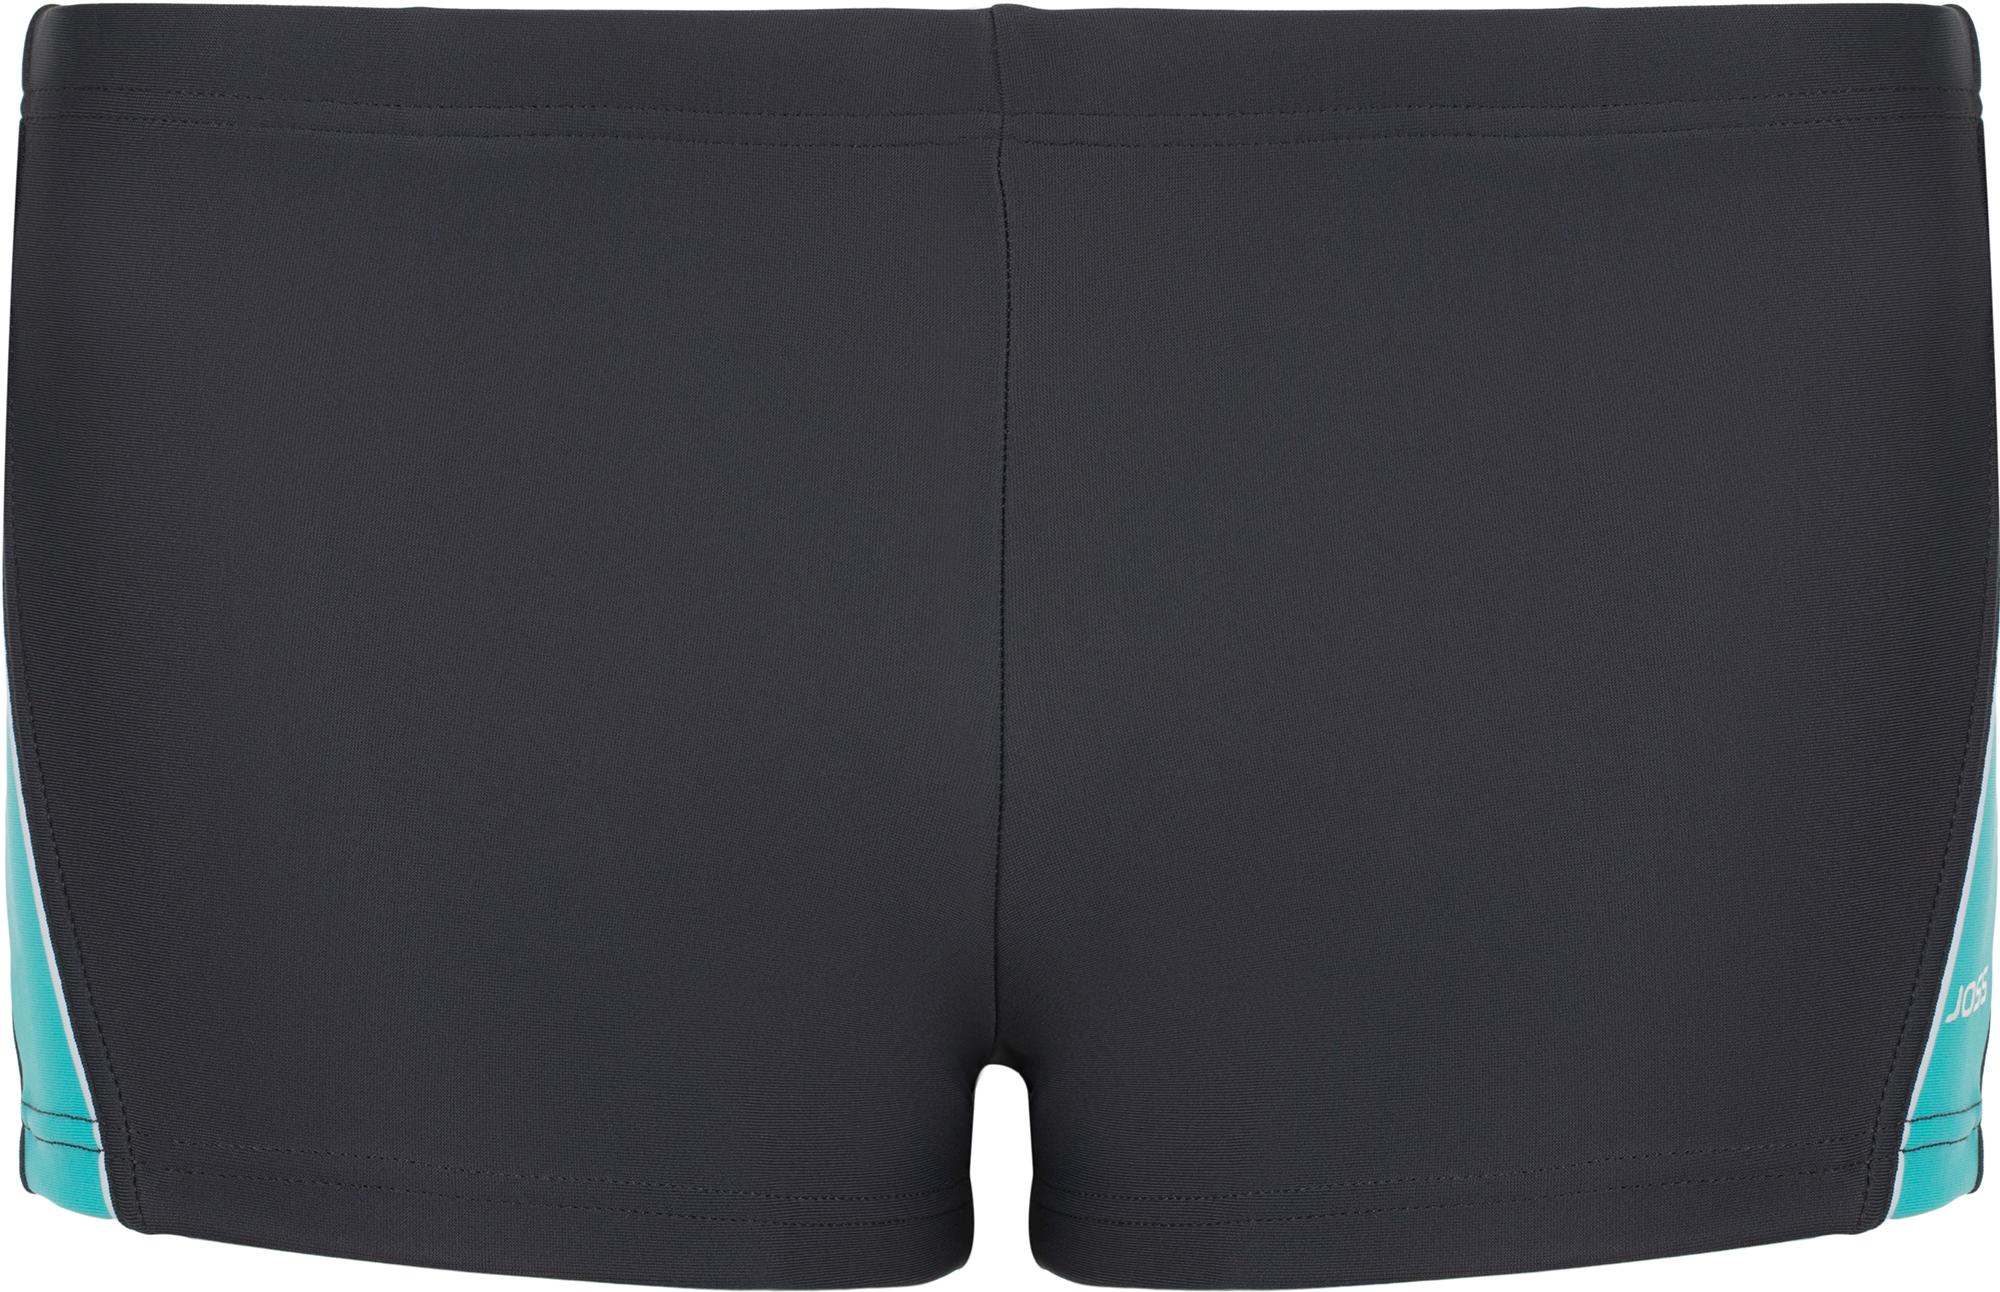 Joss Плавки-шорты для мальчиков Joss, размер 128 joss плавки для мальчиков joss размер 128